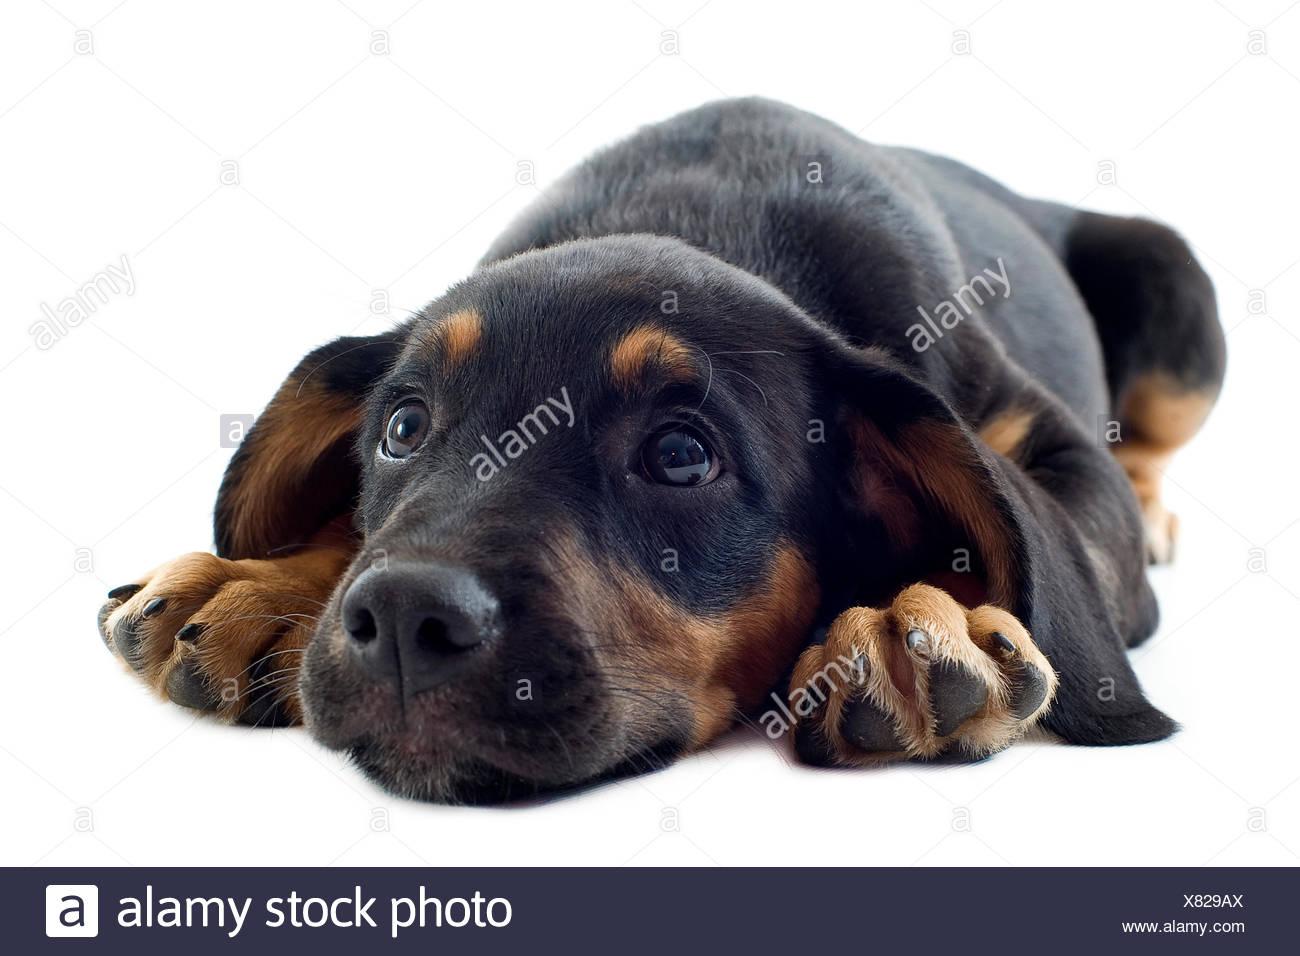 Pet Portrait Dog Puppy Doberman Pinscher Head Animal Sad